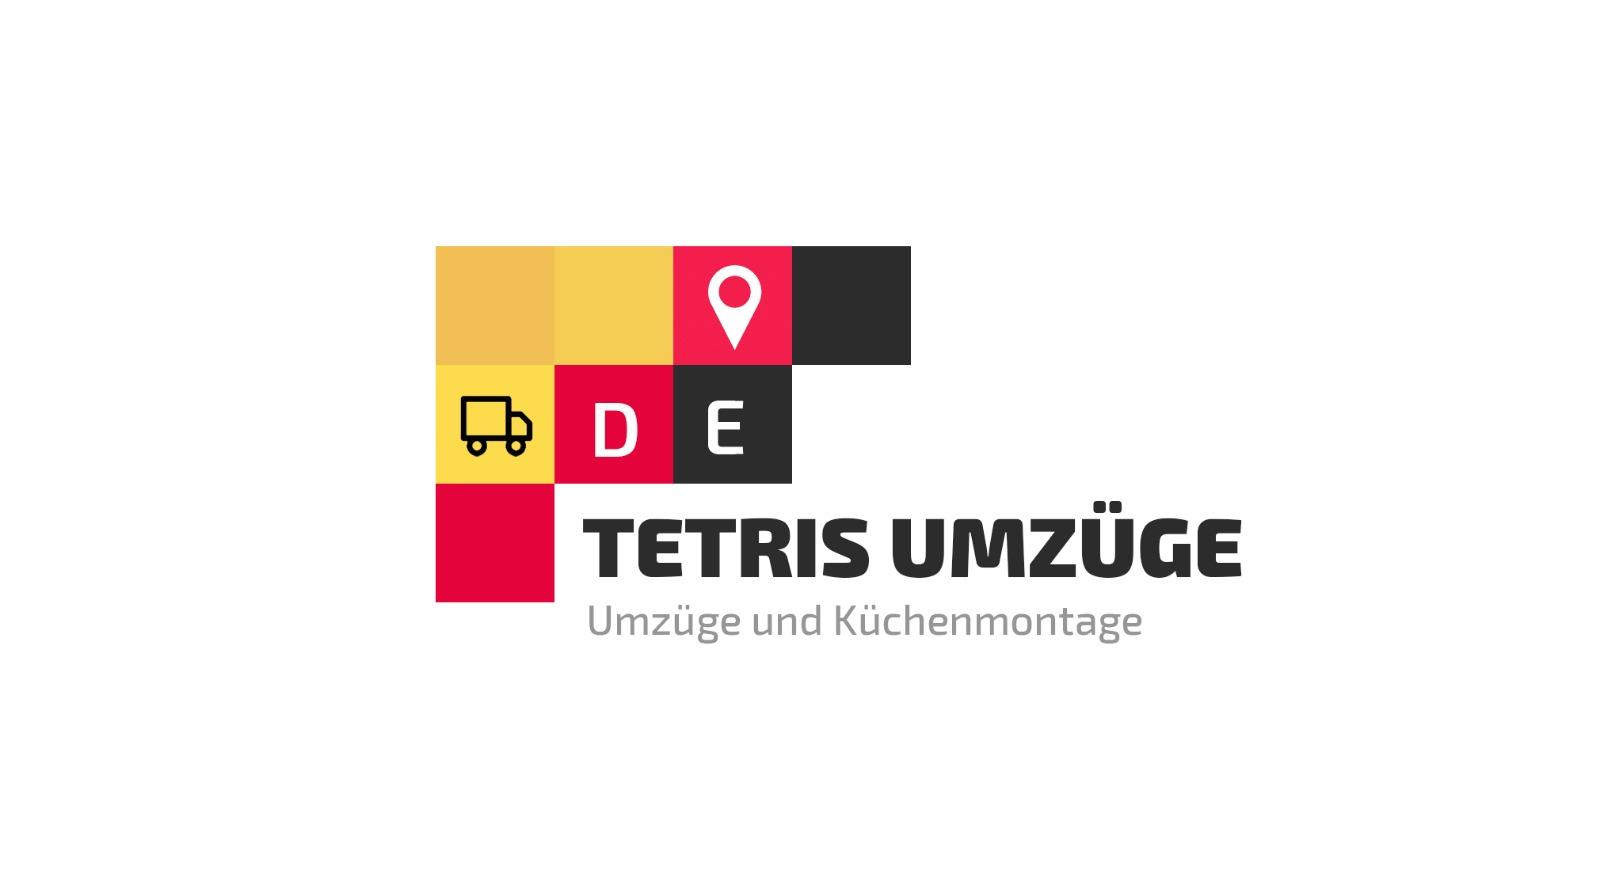 de-tetris-umzuege-und-kuechenmontage-logo